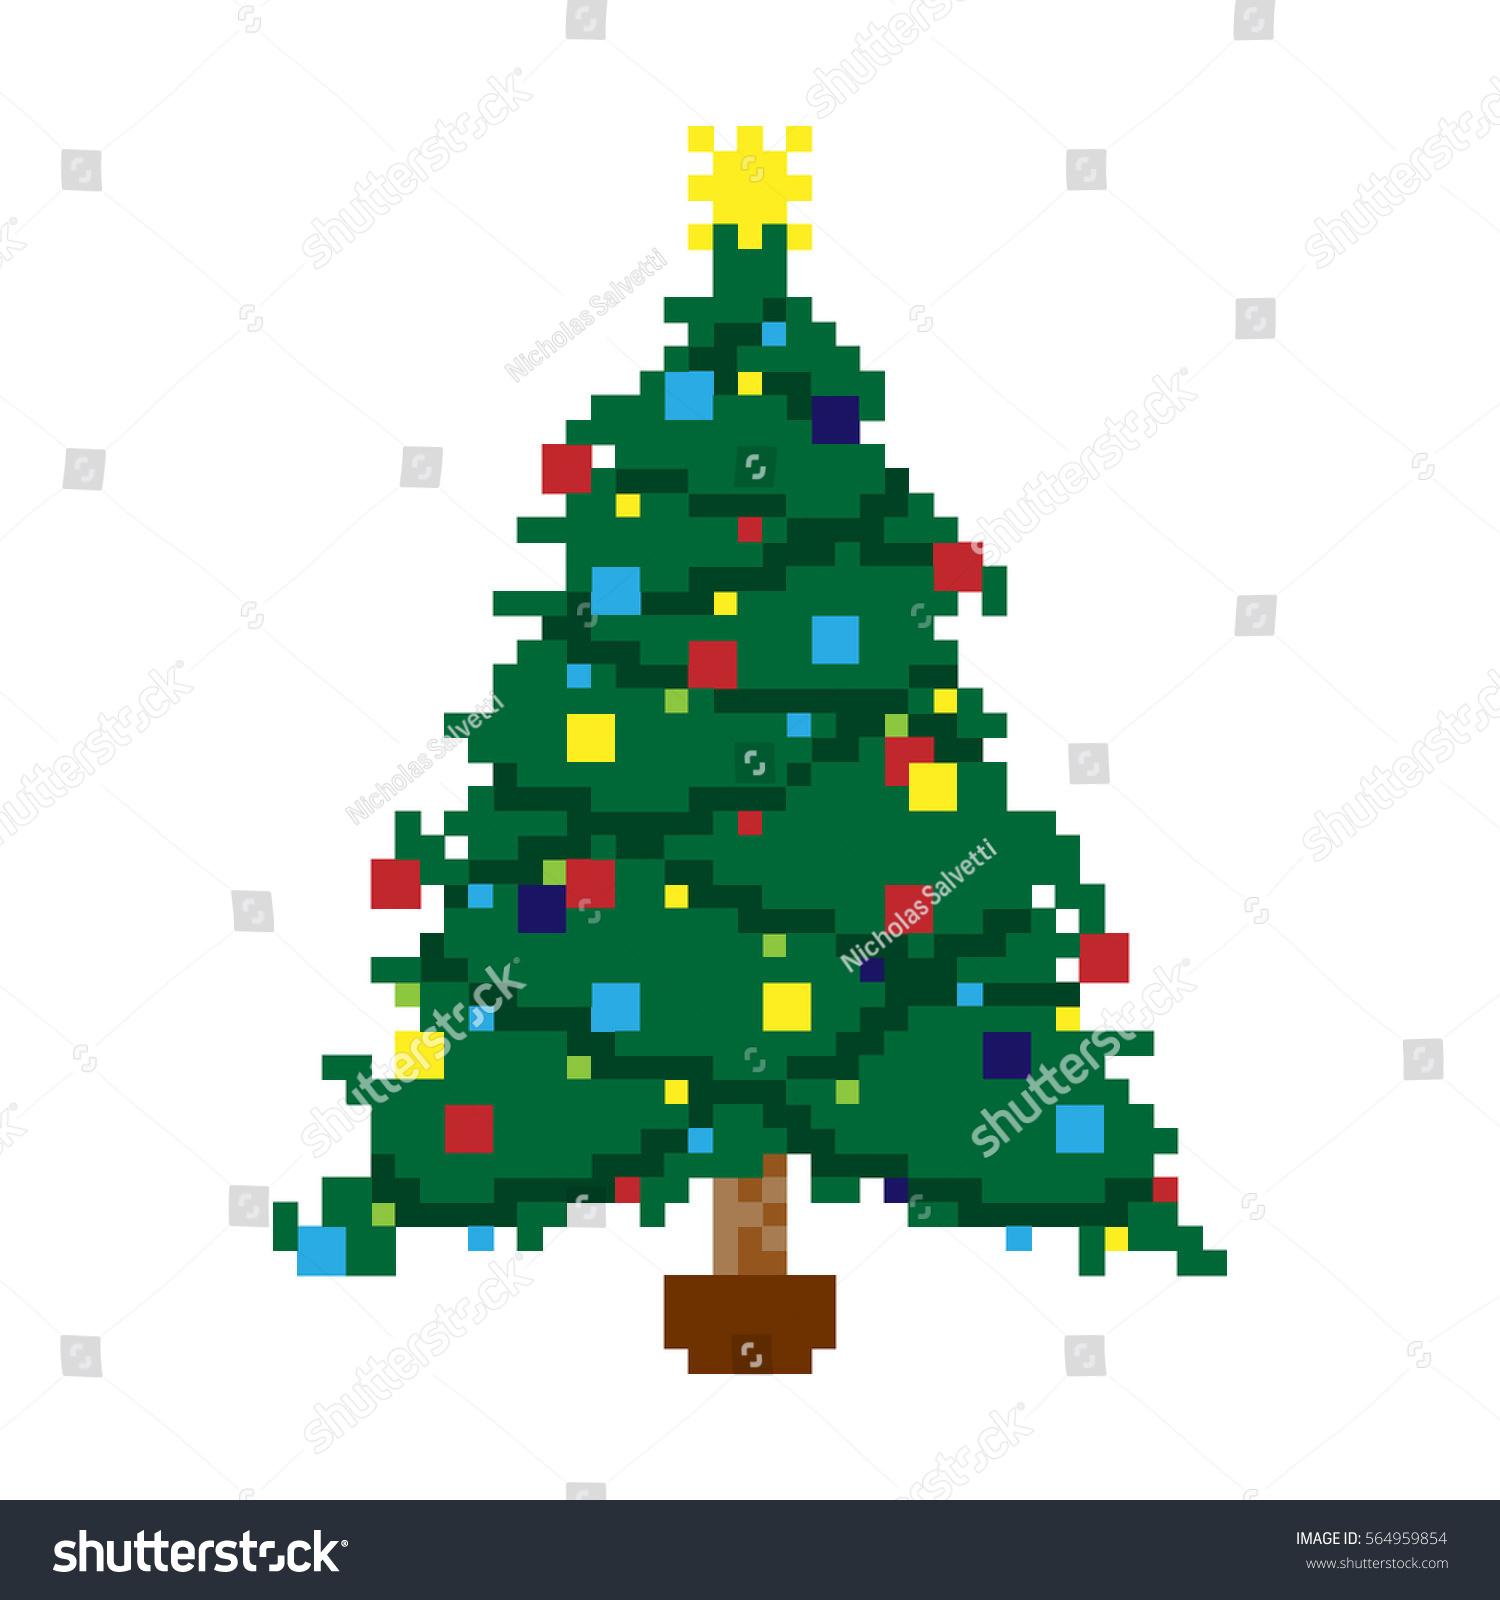 Vector Illustration Pixel Christmas Tree Stock Vector 564959854 ...